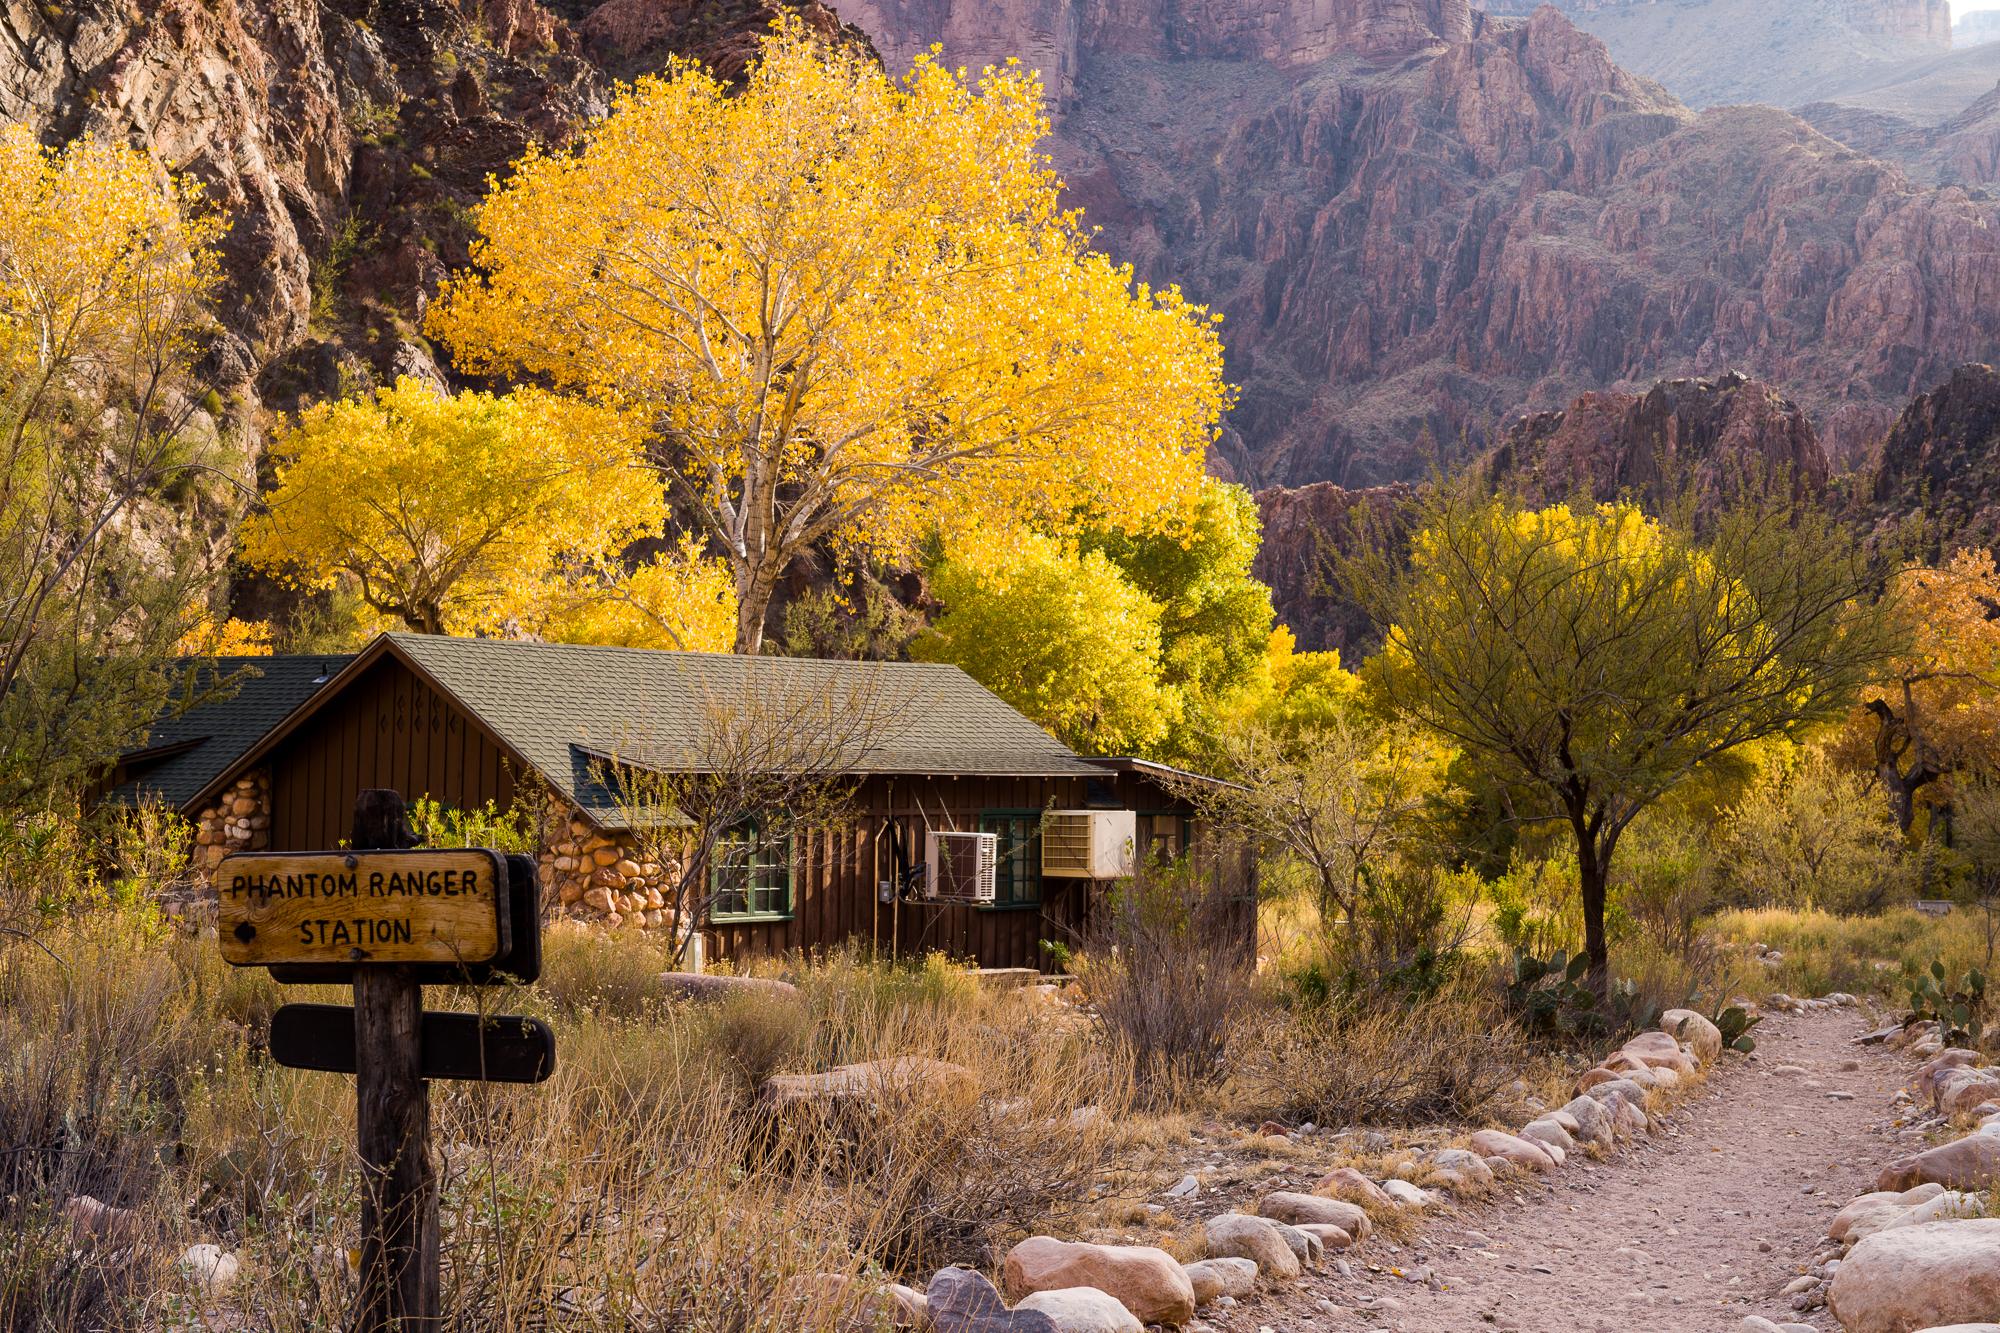 Phantom Ranch ranger station